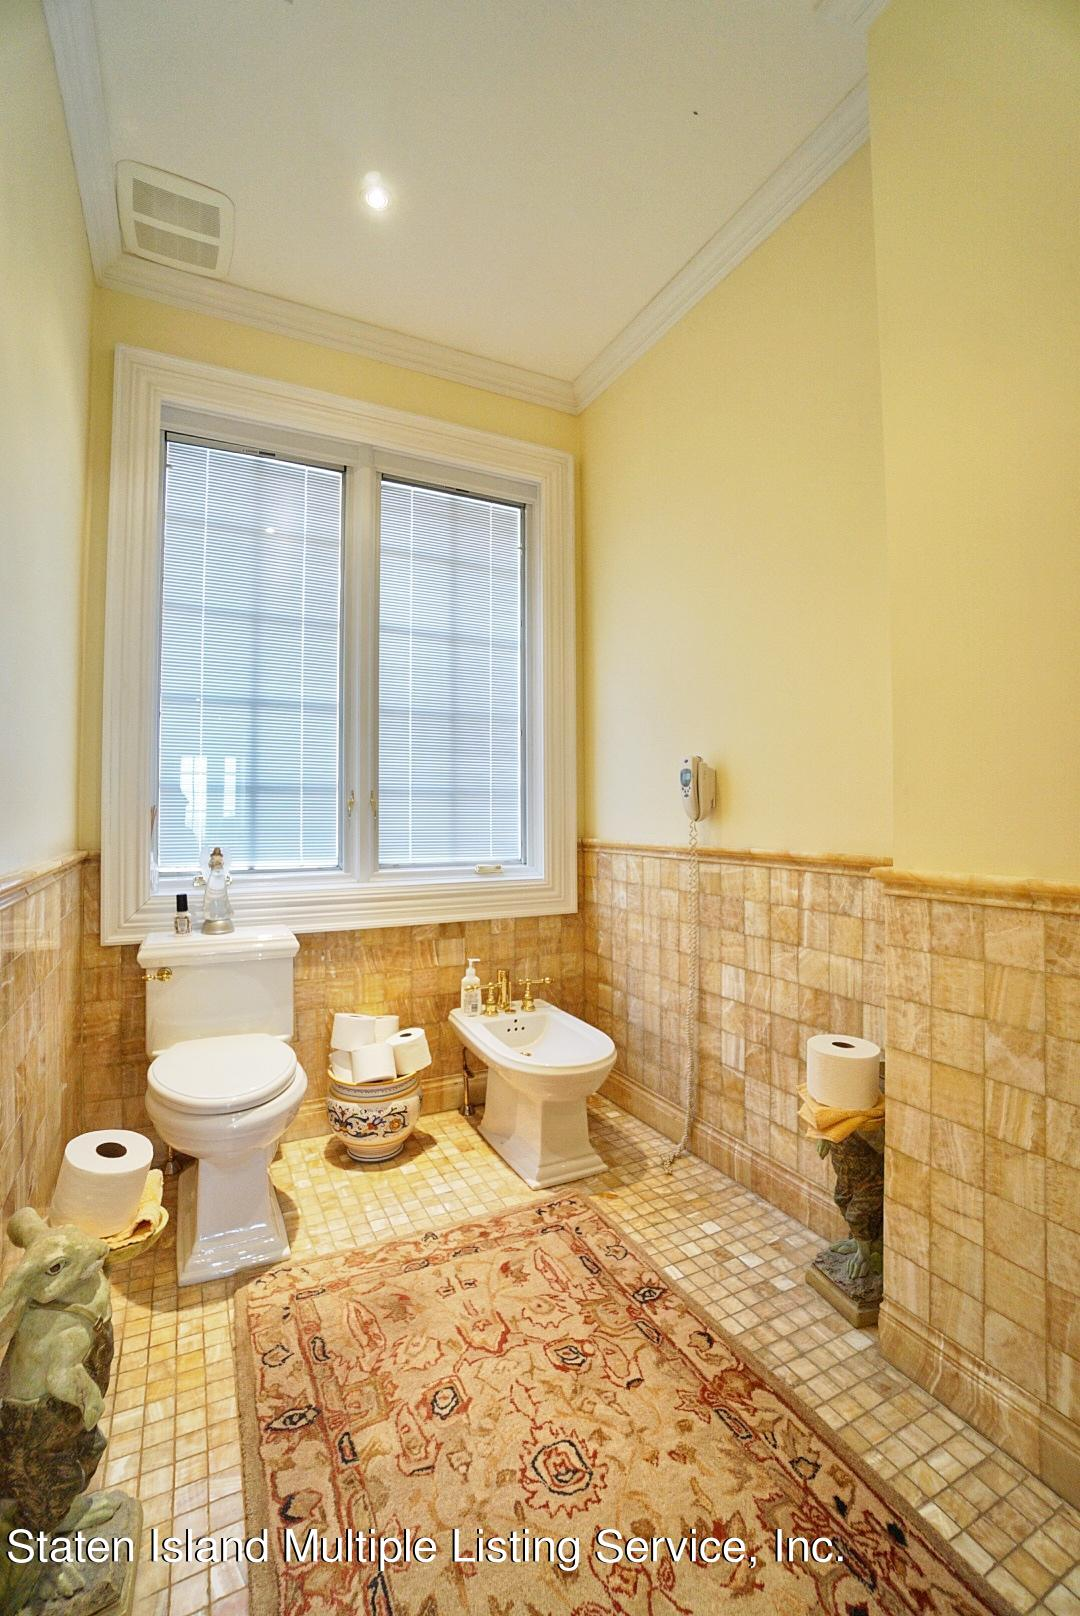 Single Family - Detached 129 Coverly Avenue   Staten Island, NY 10301, MLS-1144490-40